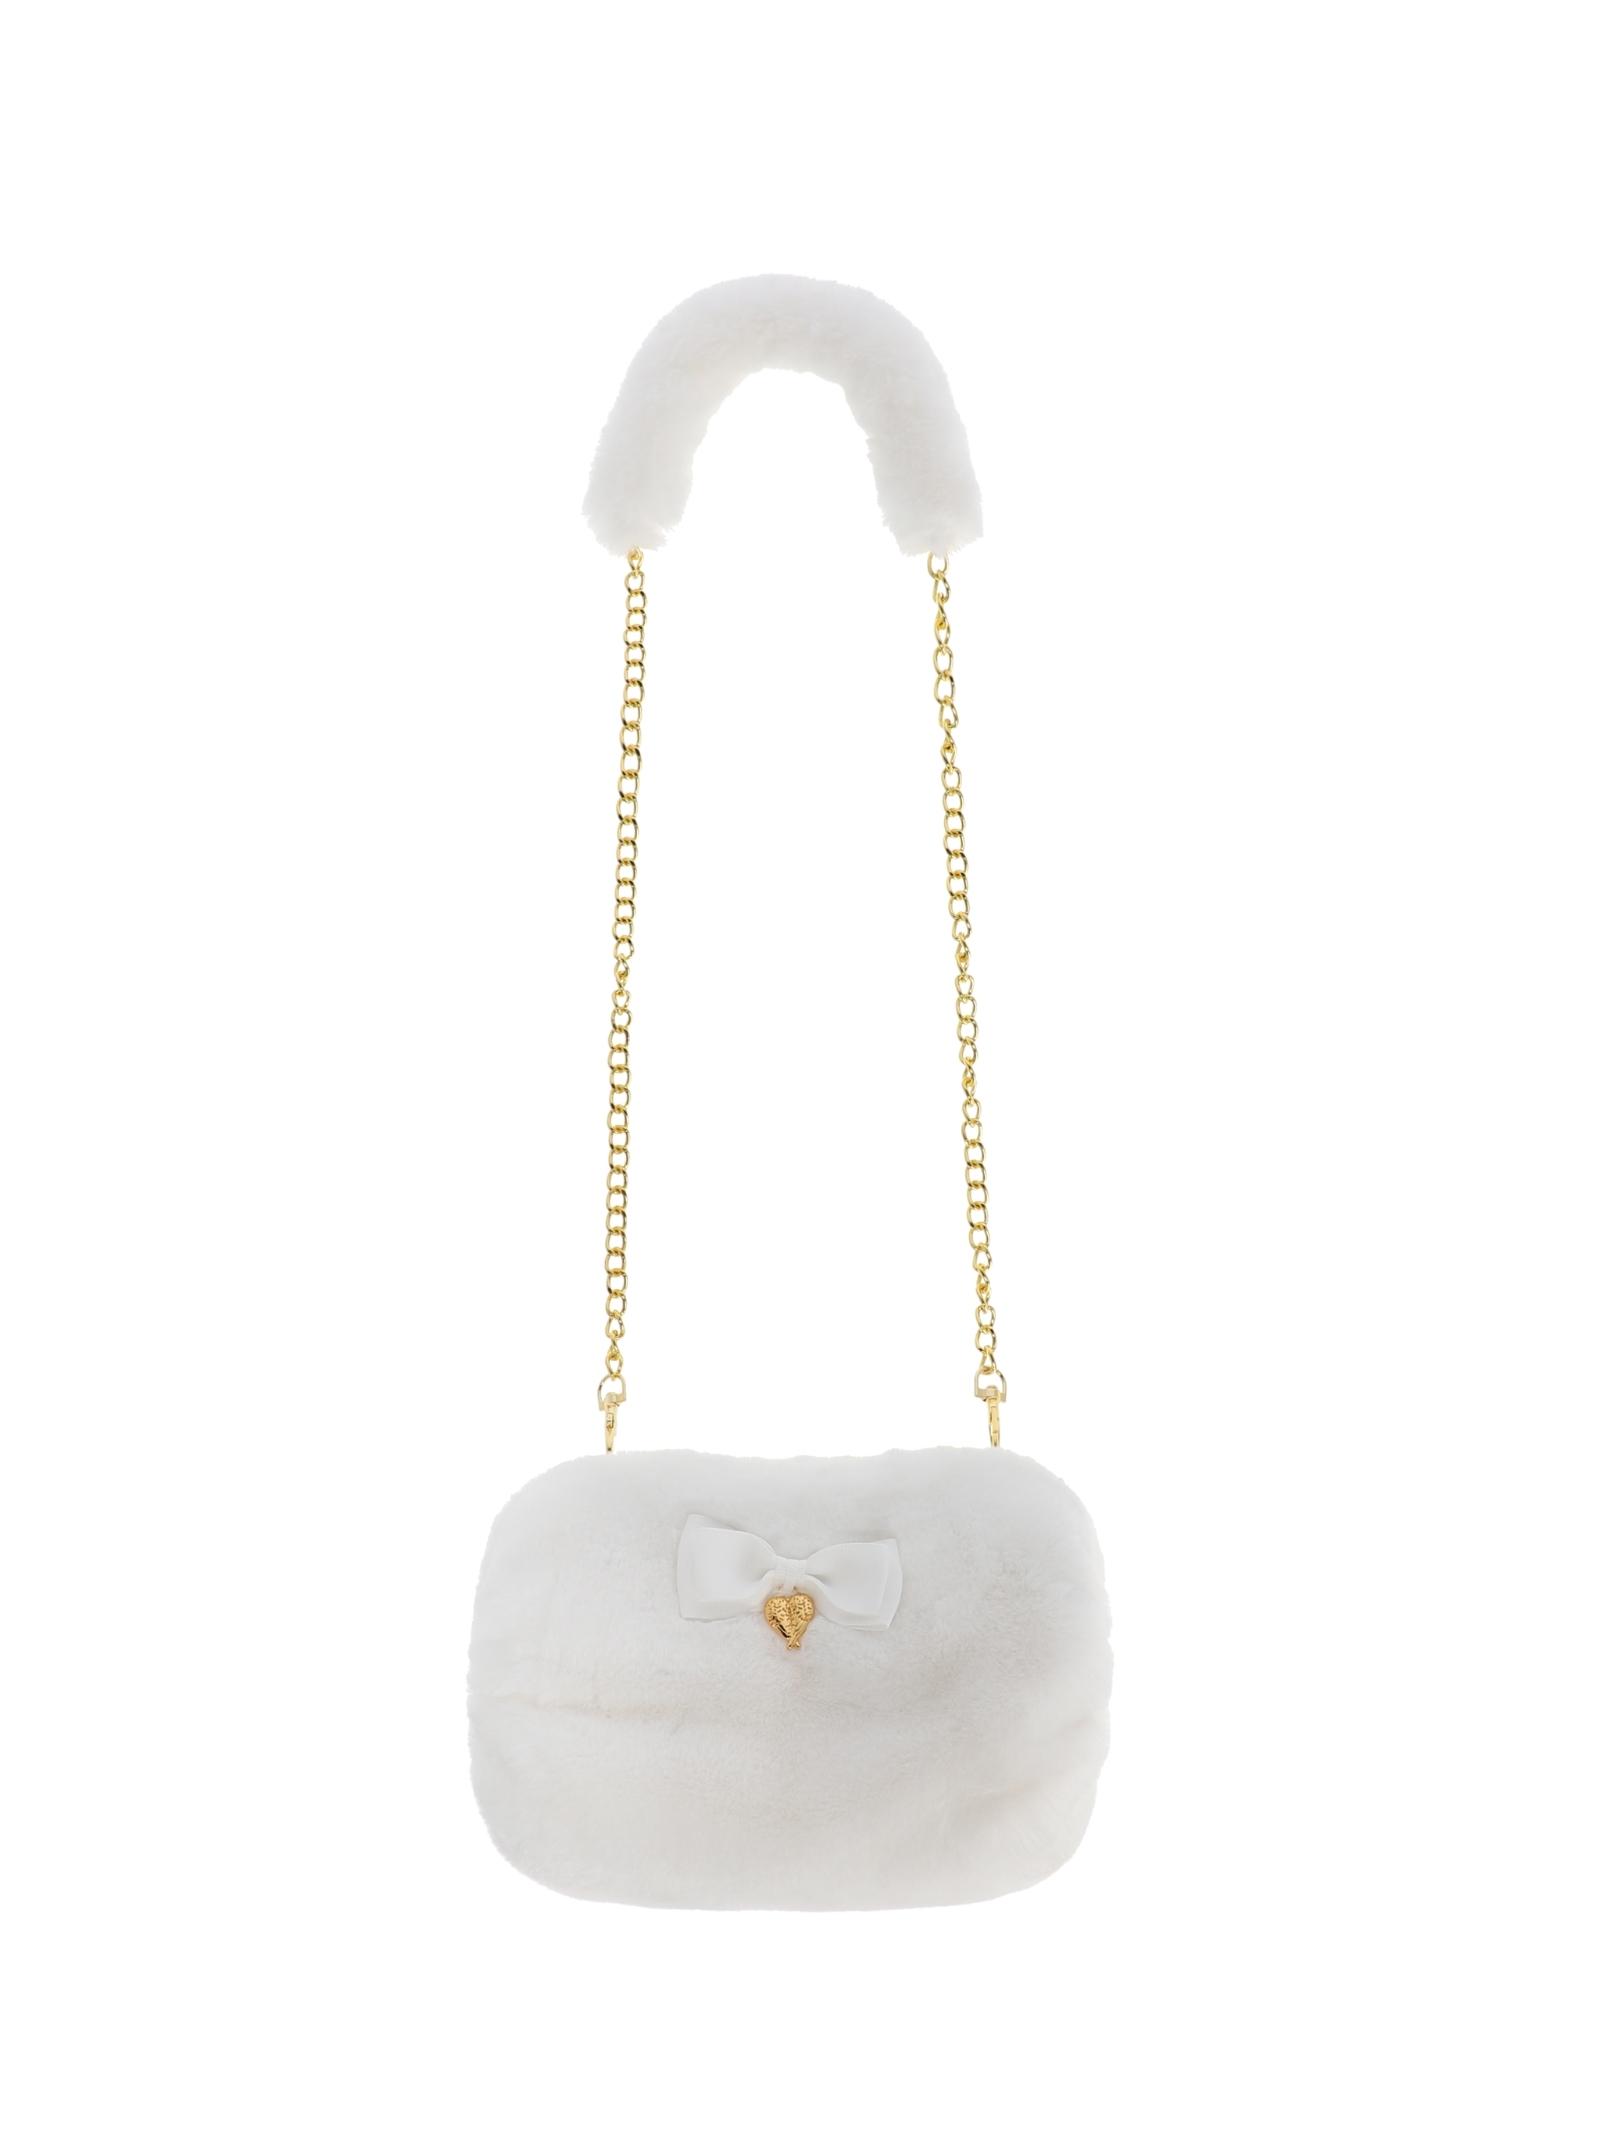 Mandy Snowdrop Girl Bag ANGEL'S FACE | bags | MANDYSNOWDROP